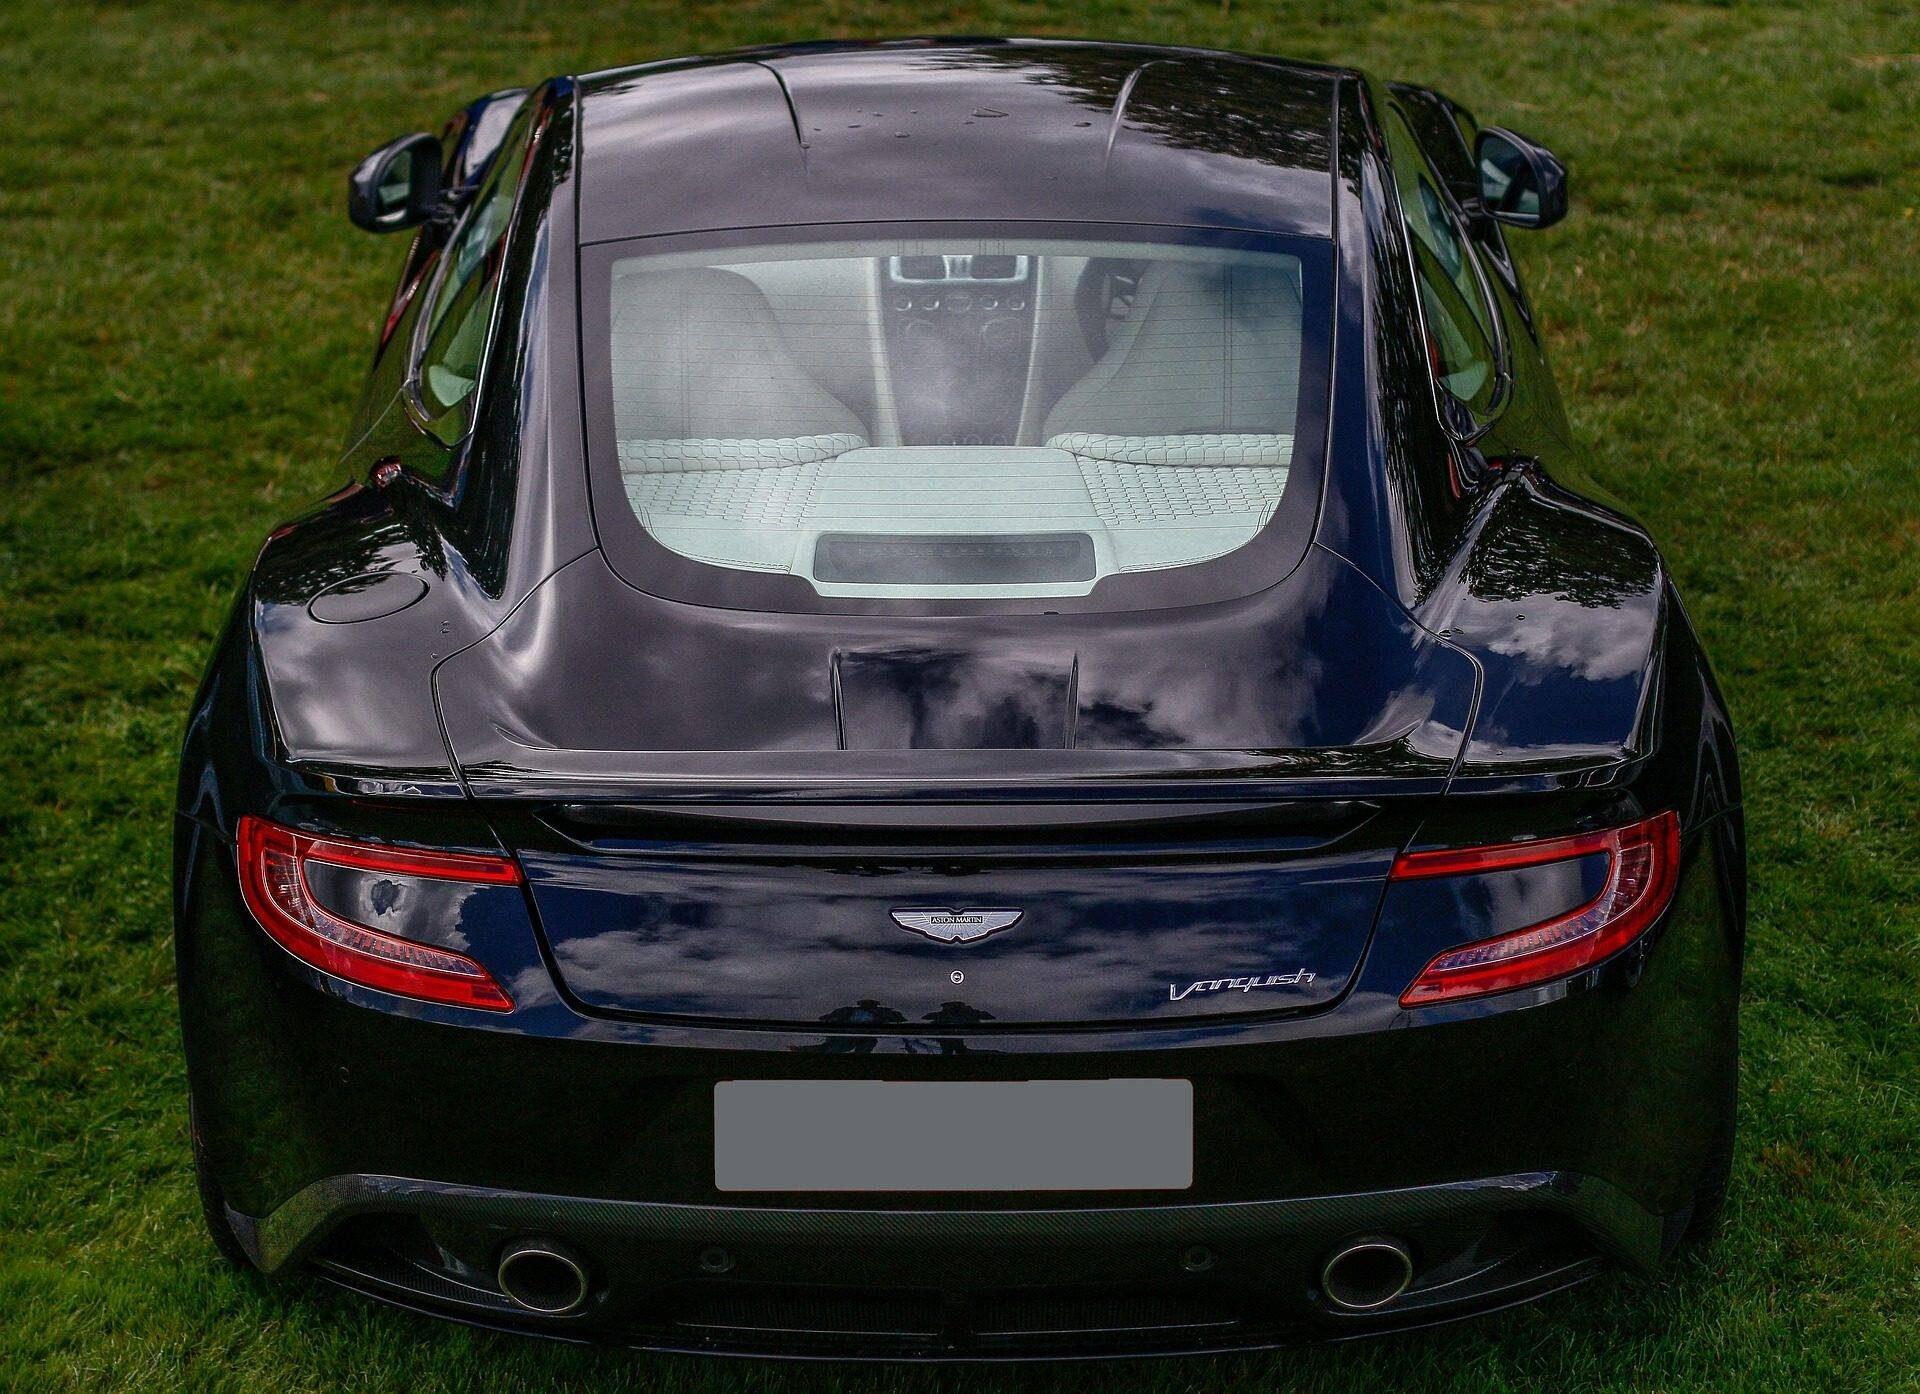 Aston Martin Vanquish V12 2002